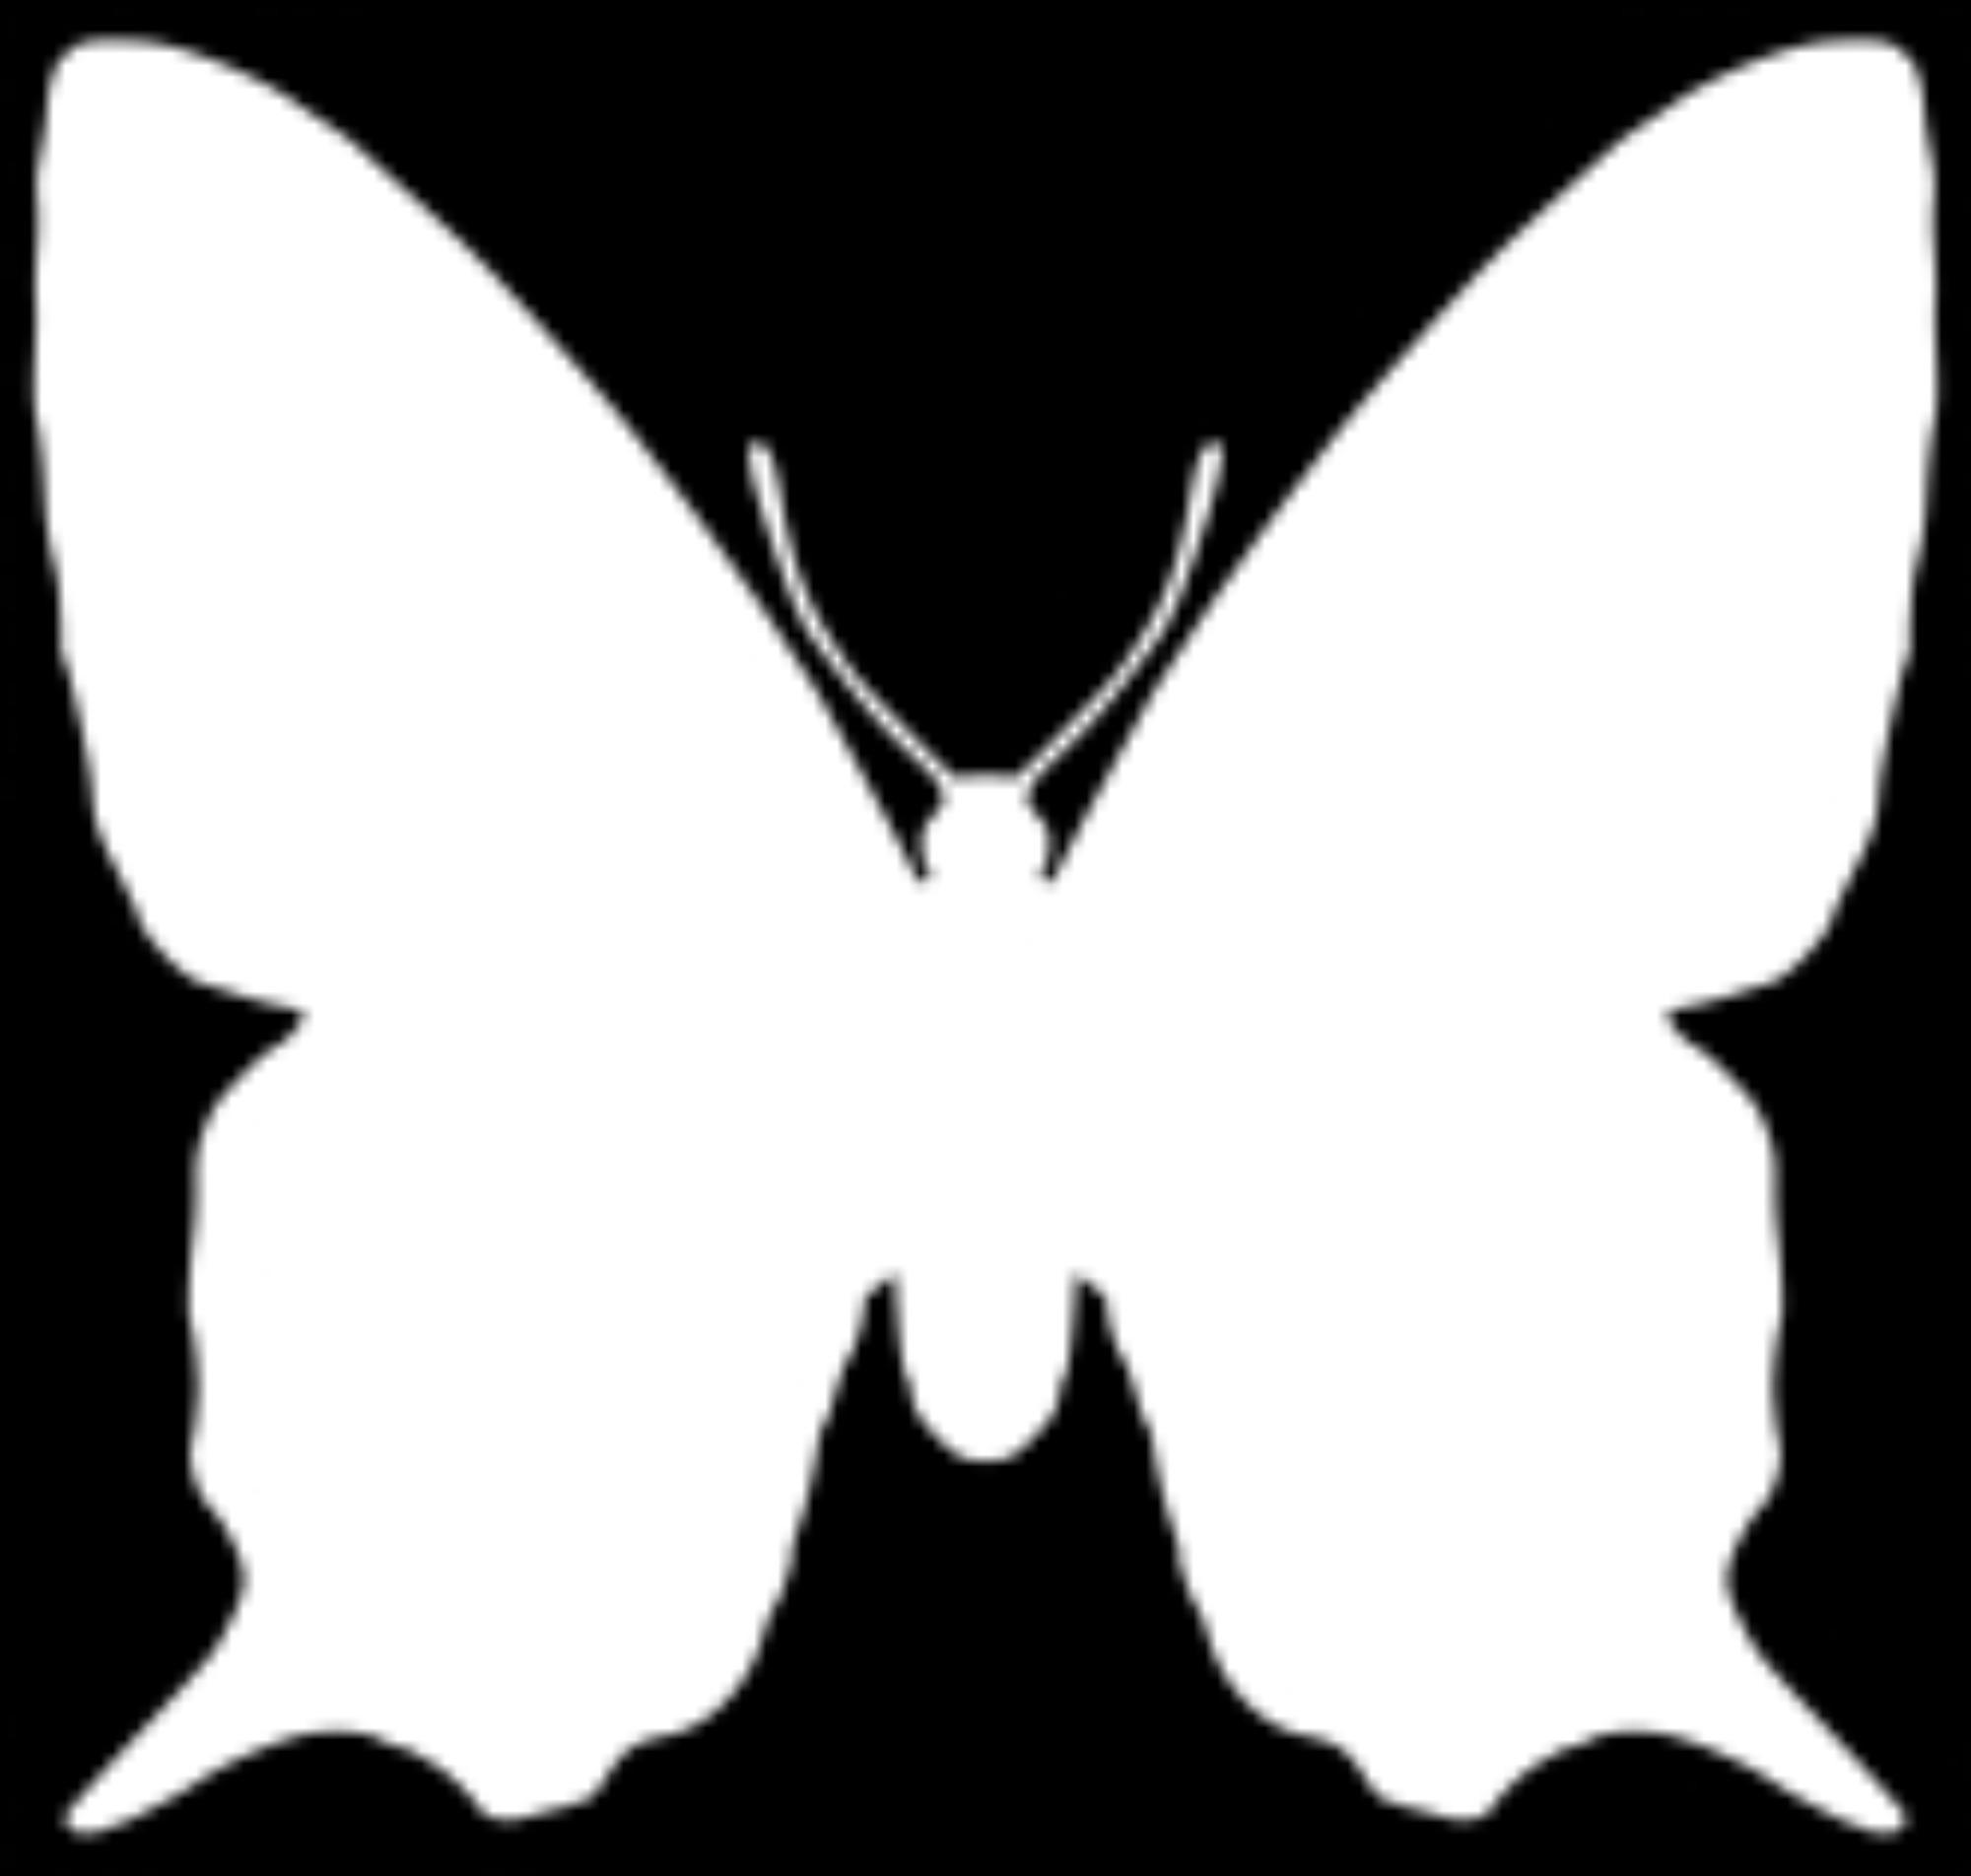 inverted तितली silhouette